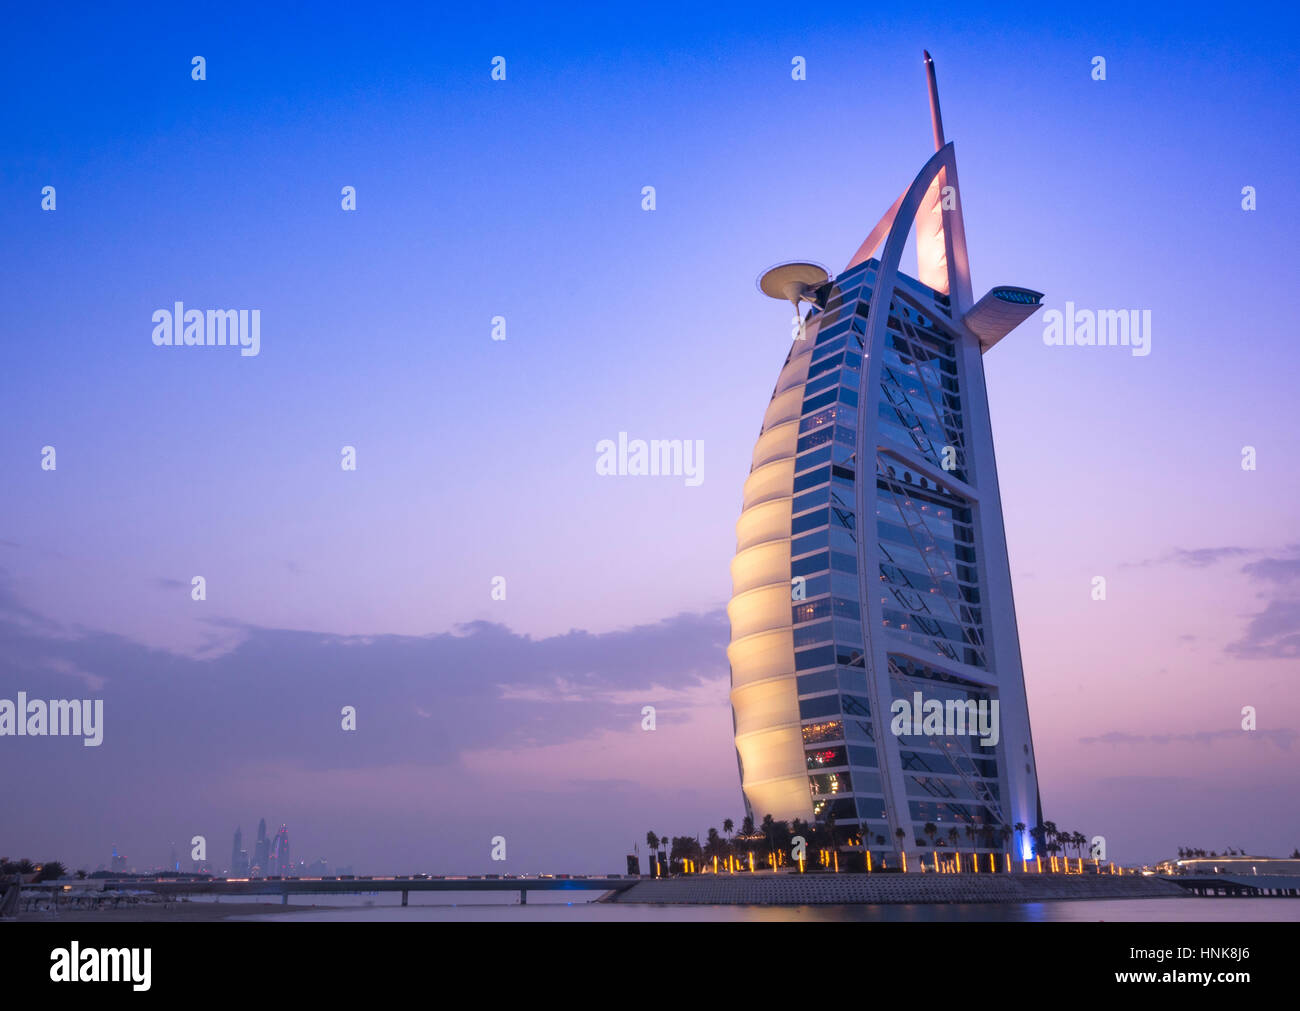 DUBAI, UAE - JANUARY 20 : Burj Al Arab - a 7-Star Hotel and one of the most famous landmark of United Arab Emirates. - Stock Image